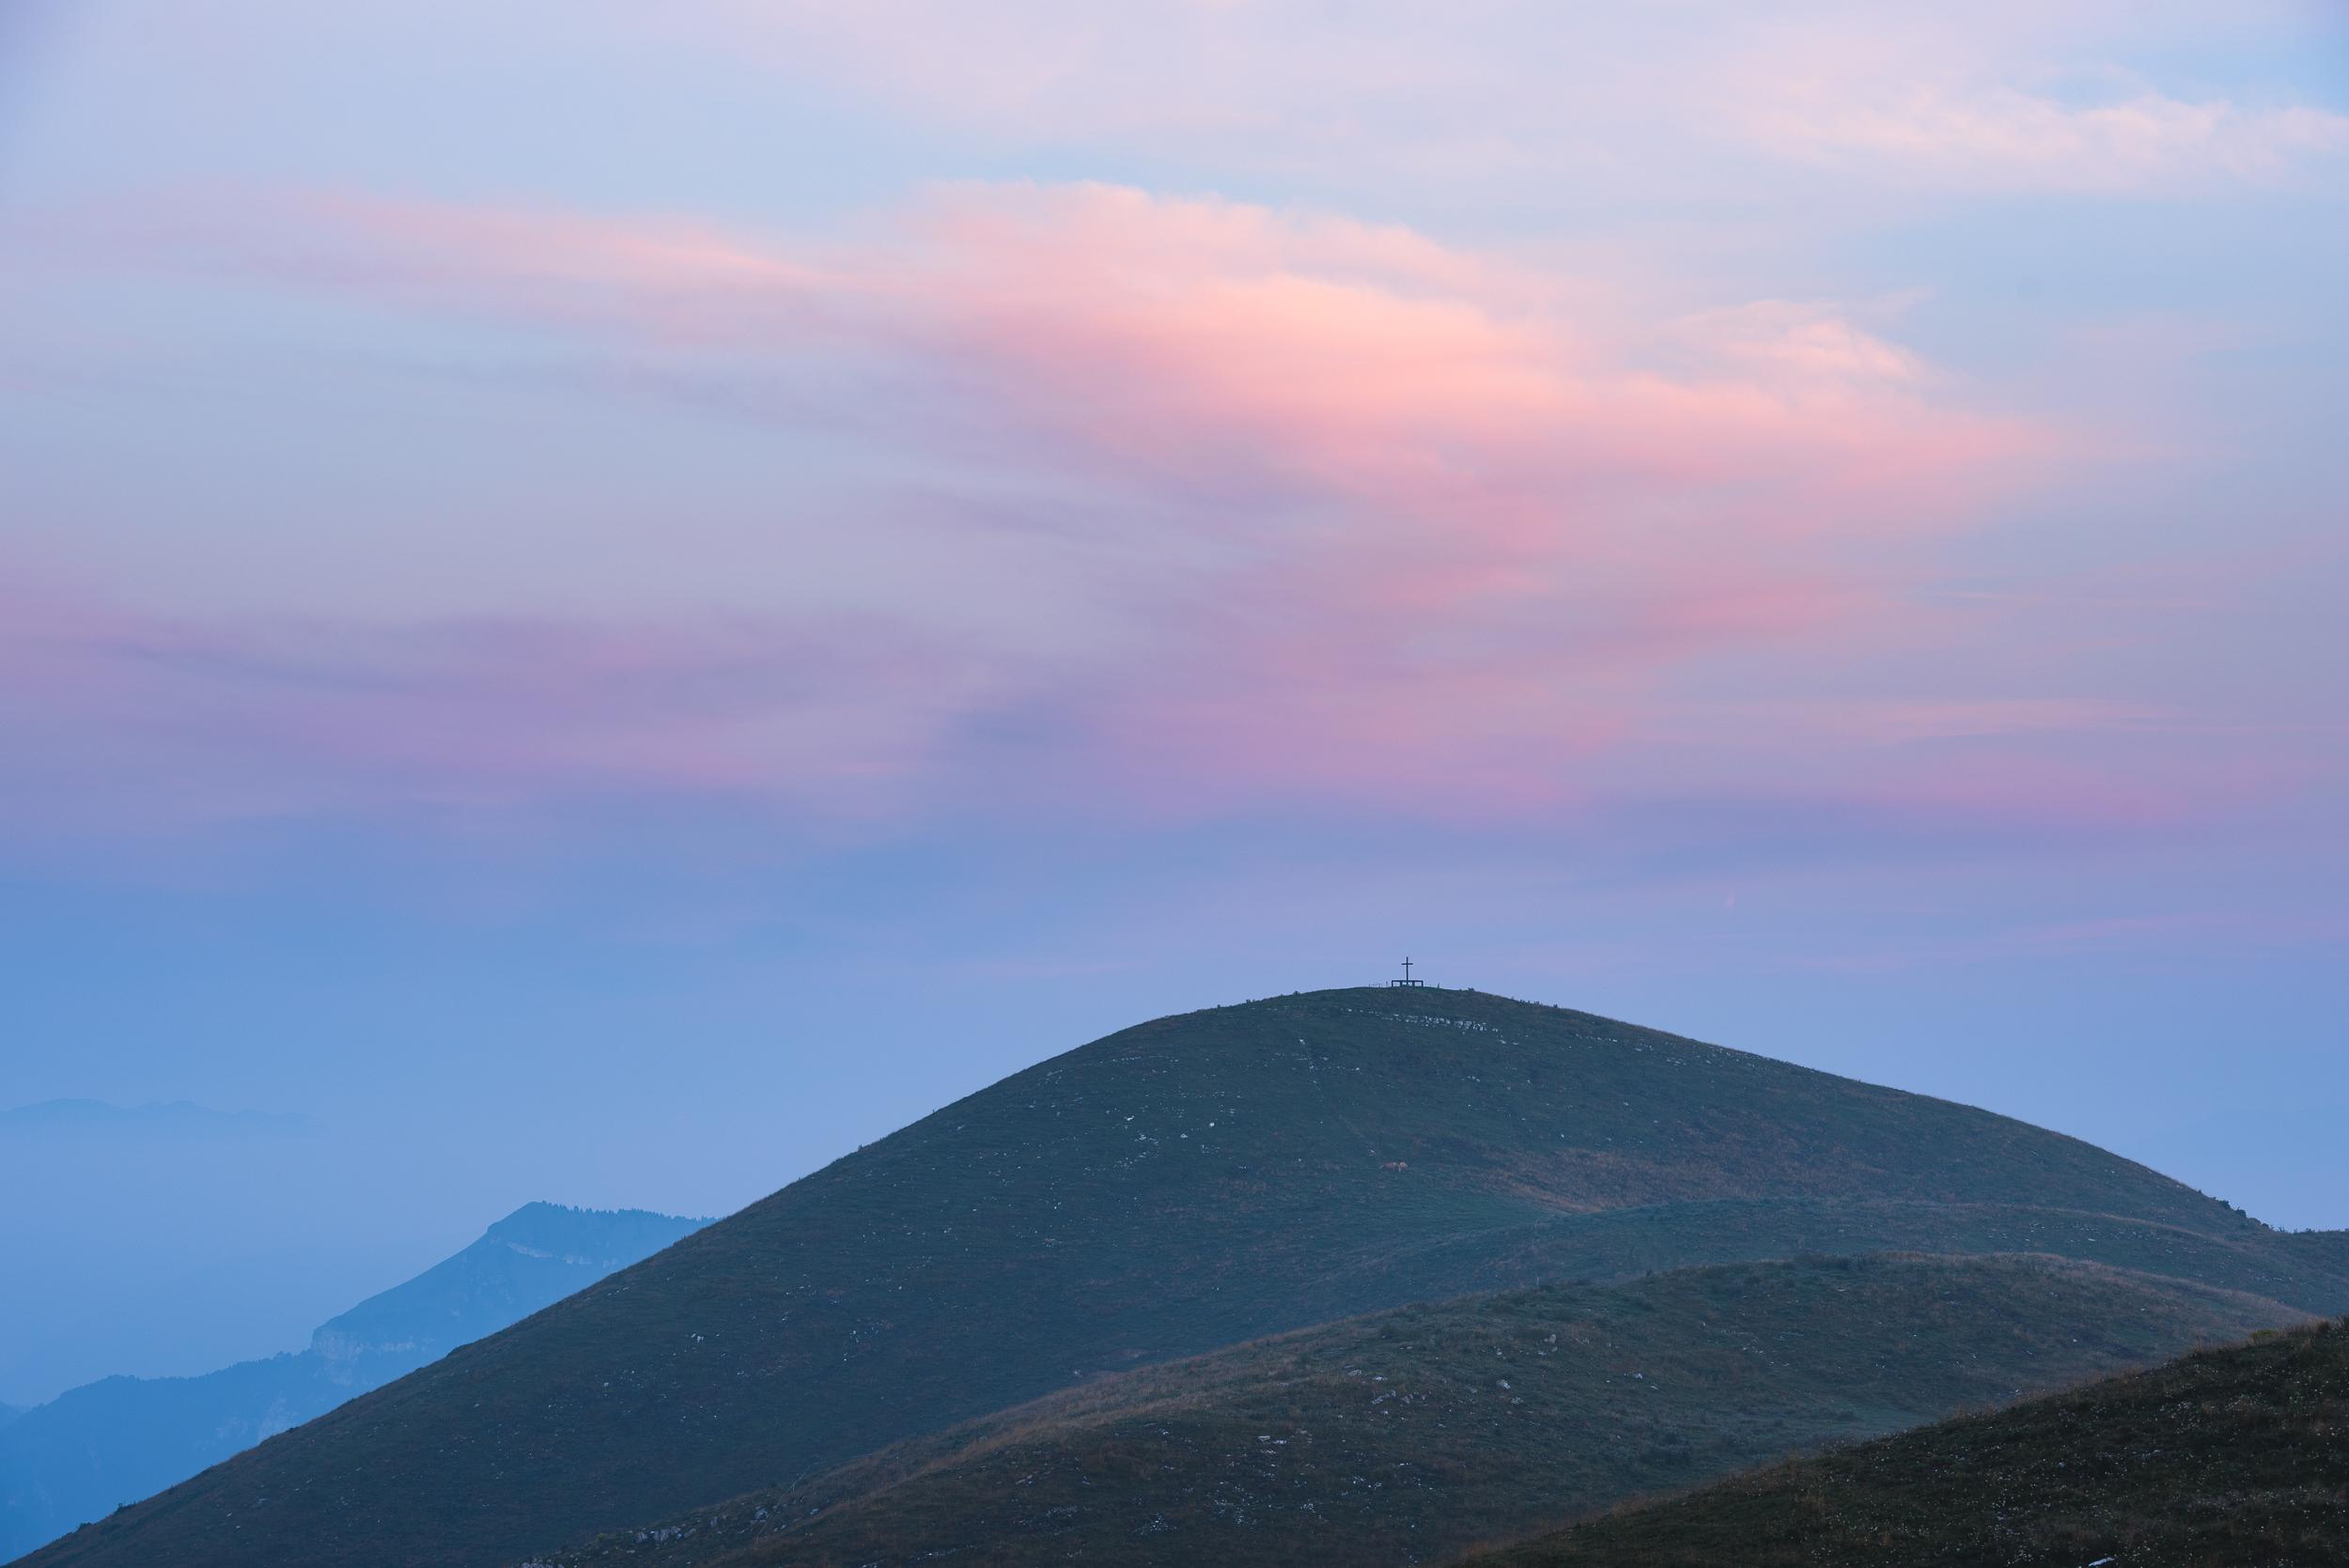 2018-08-11_Web_4888_Colourful sunrise over the hill.jpg